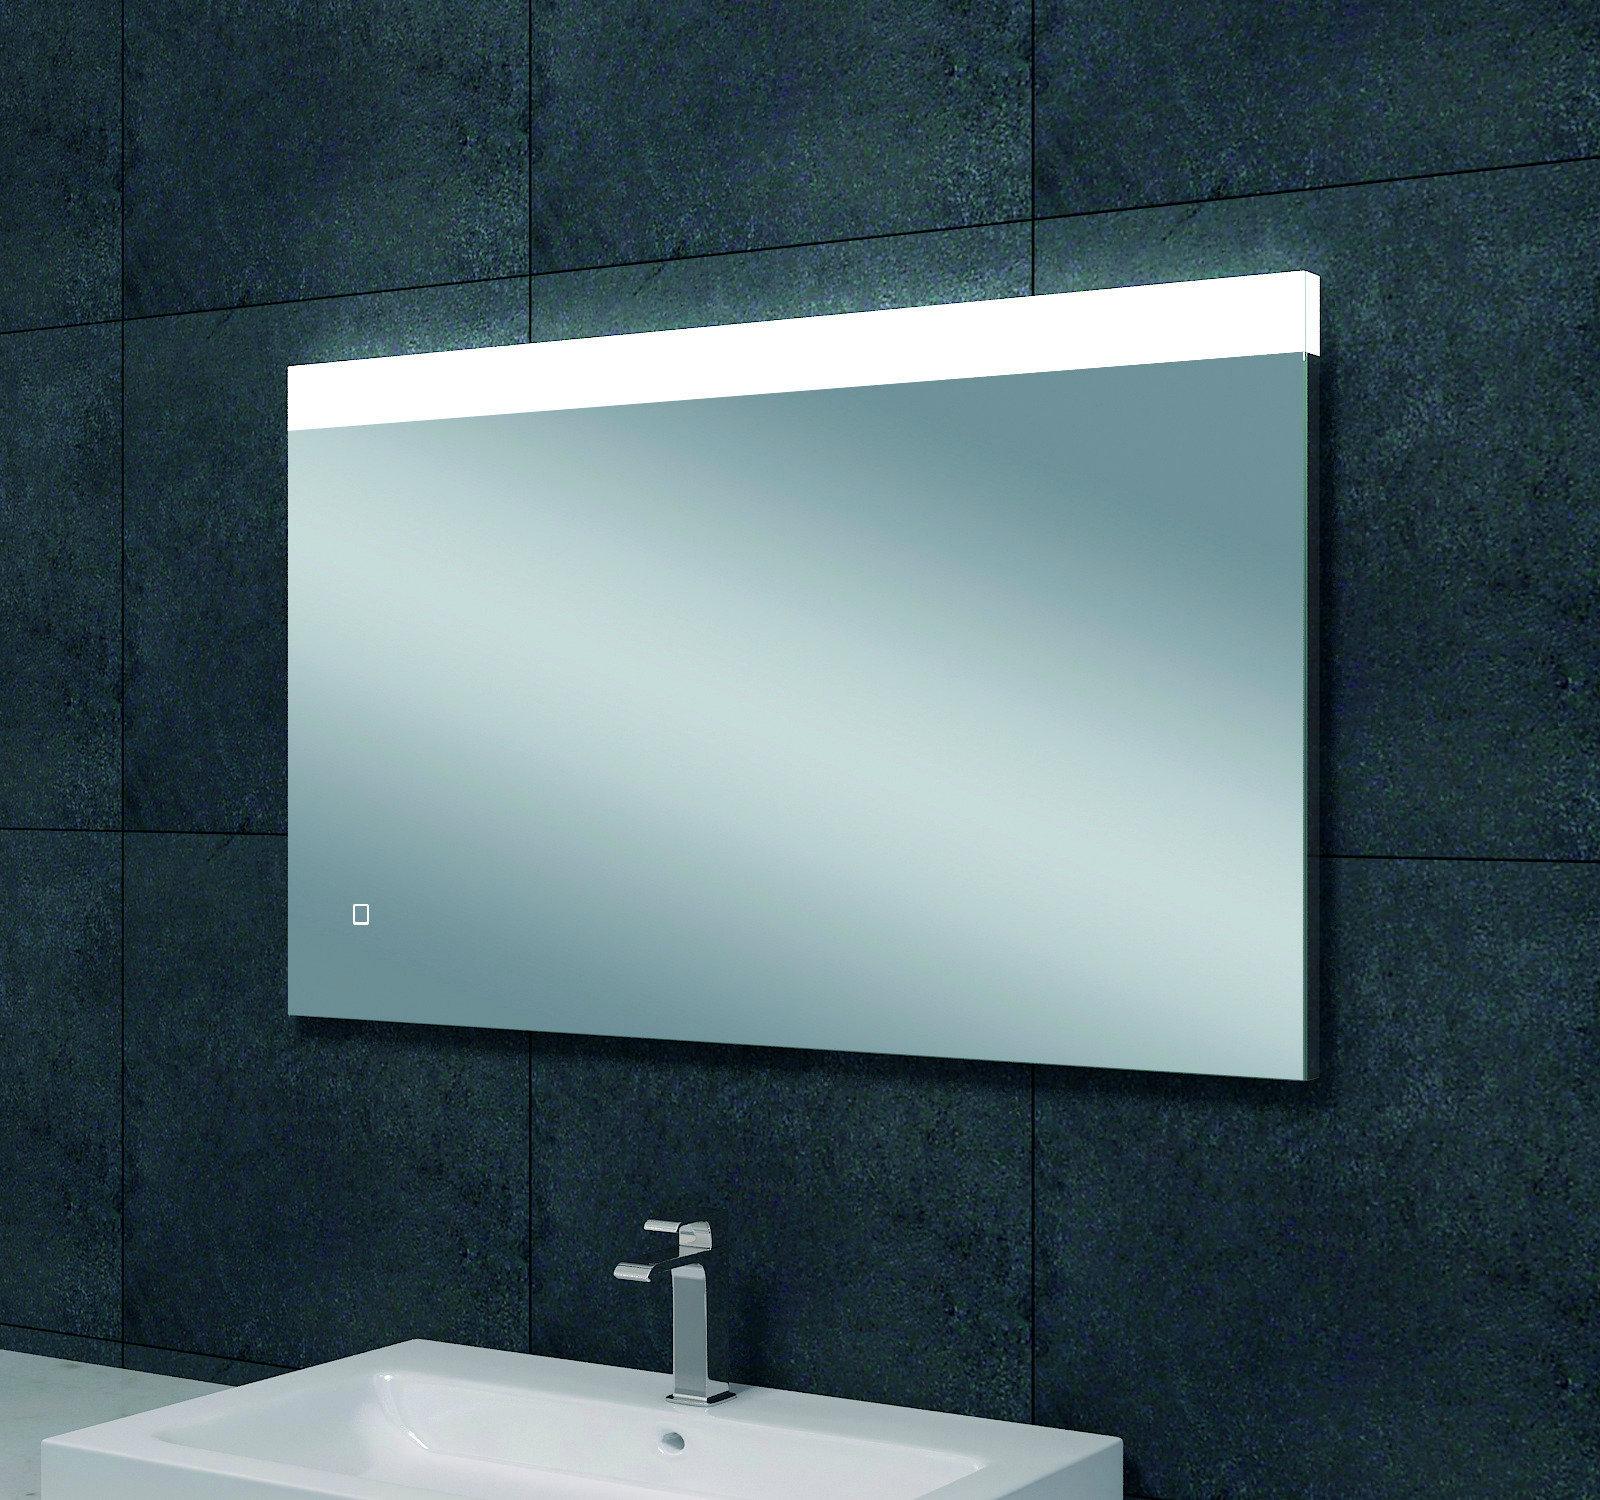 Arcon LED Badkamerspiegel Dimbaar B.100 x H.60 cm